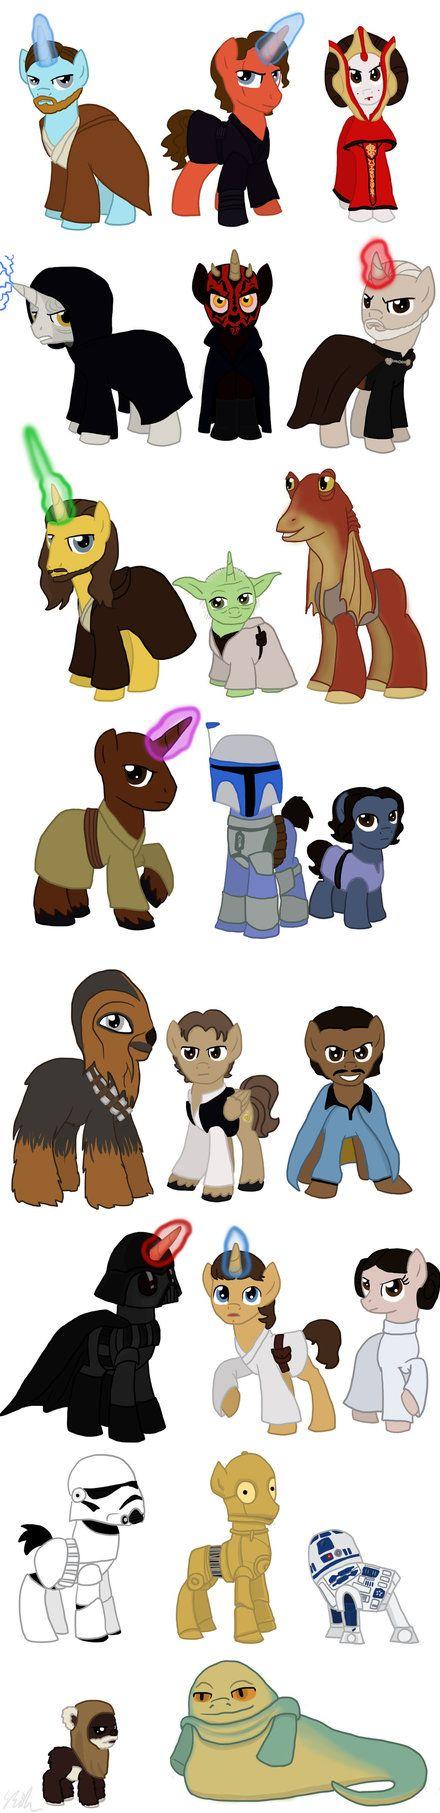 Star Wars | My Little Pony